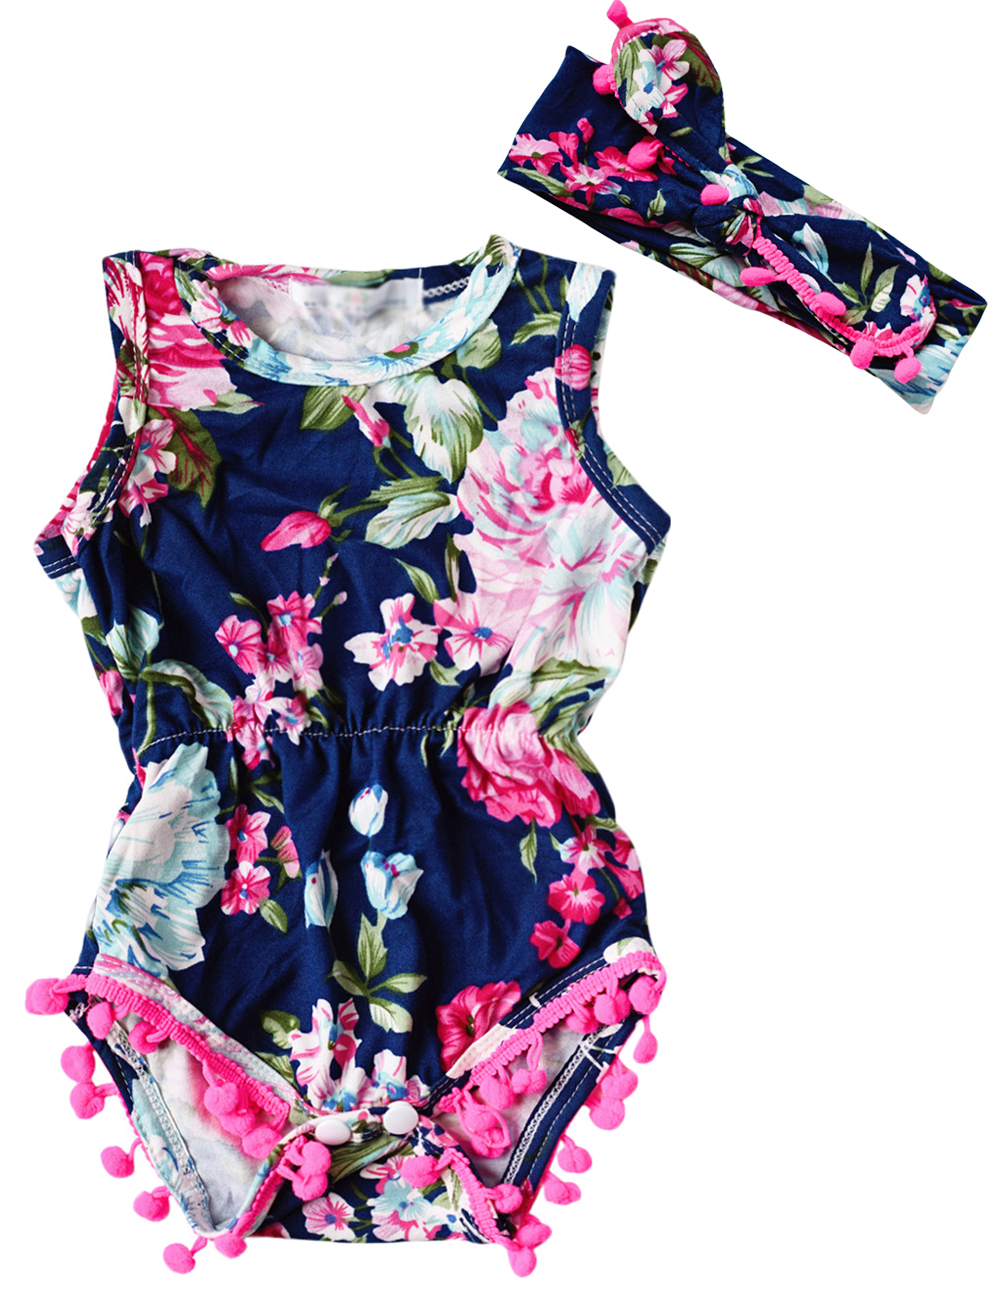 Pasgeboren baby baby meisjes Floral Romper Jumpsuit hoofdband 2 stuks - Babykleding